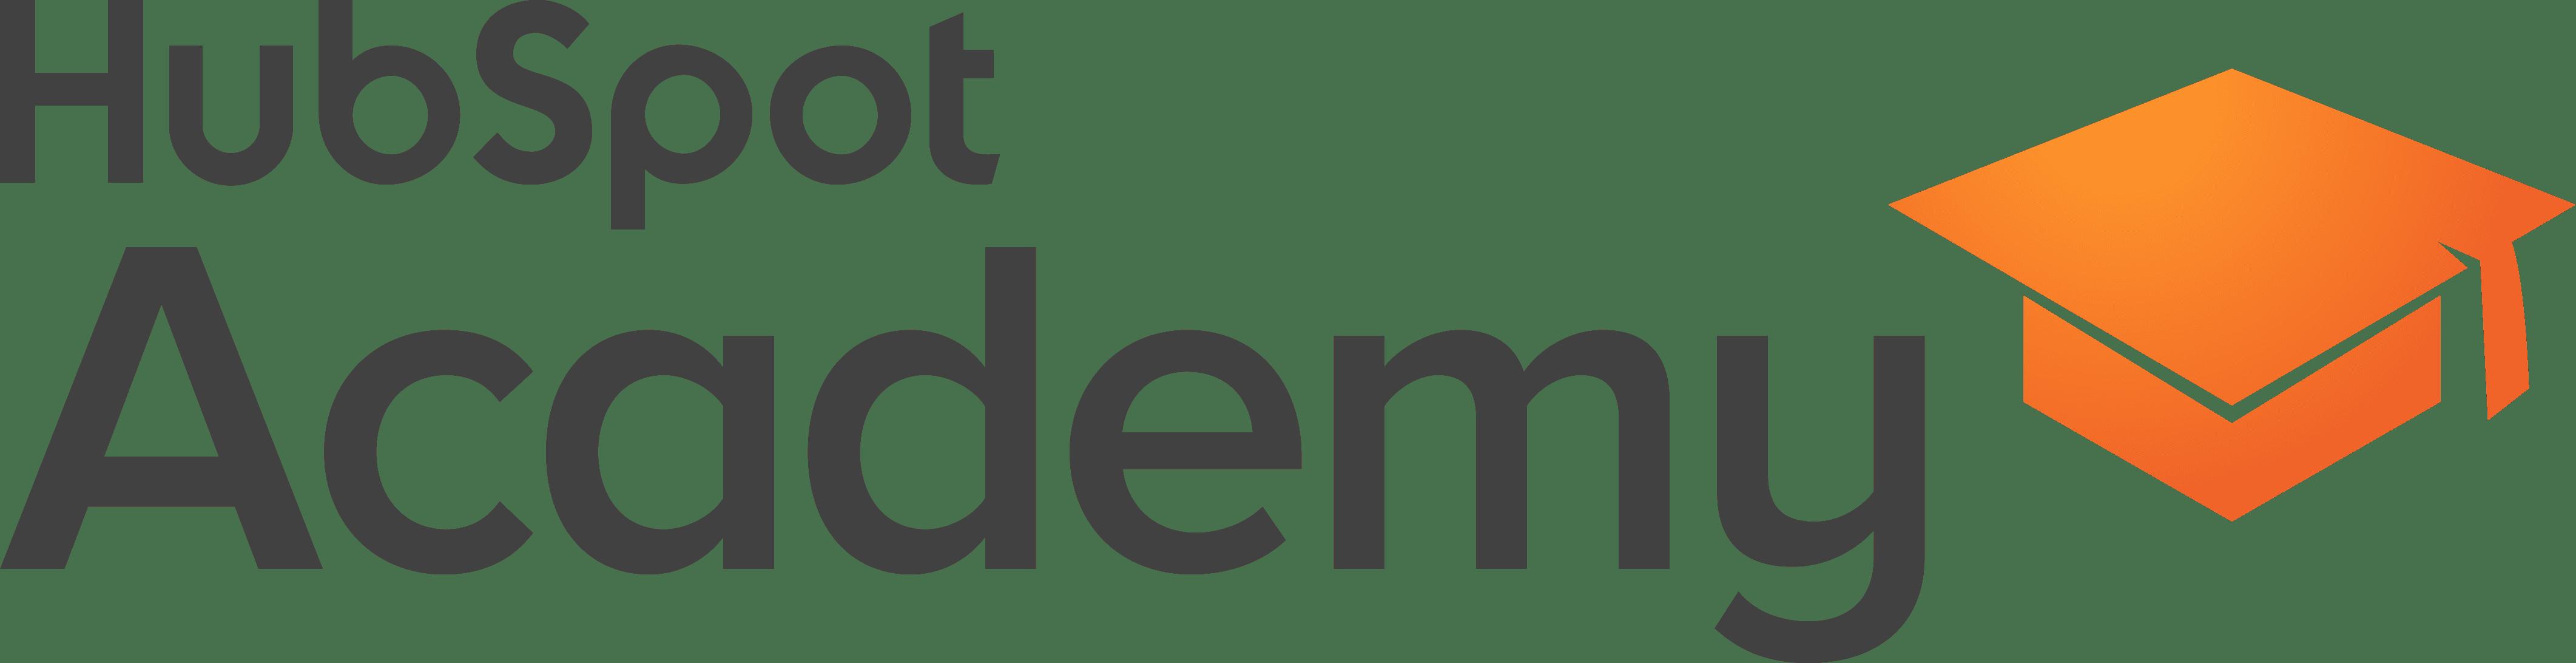 Cursos de Marketing Digital Hubspot Academy